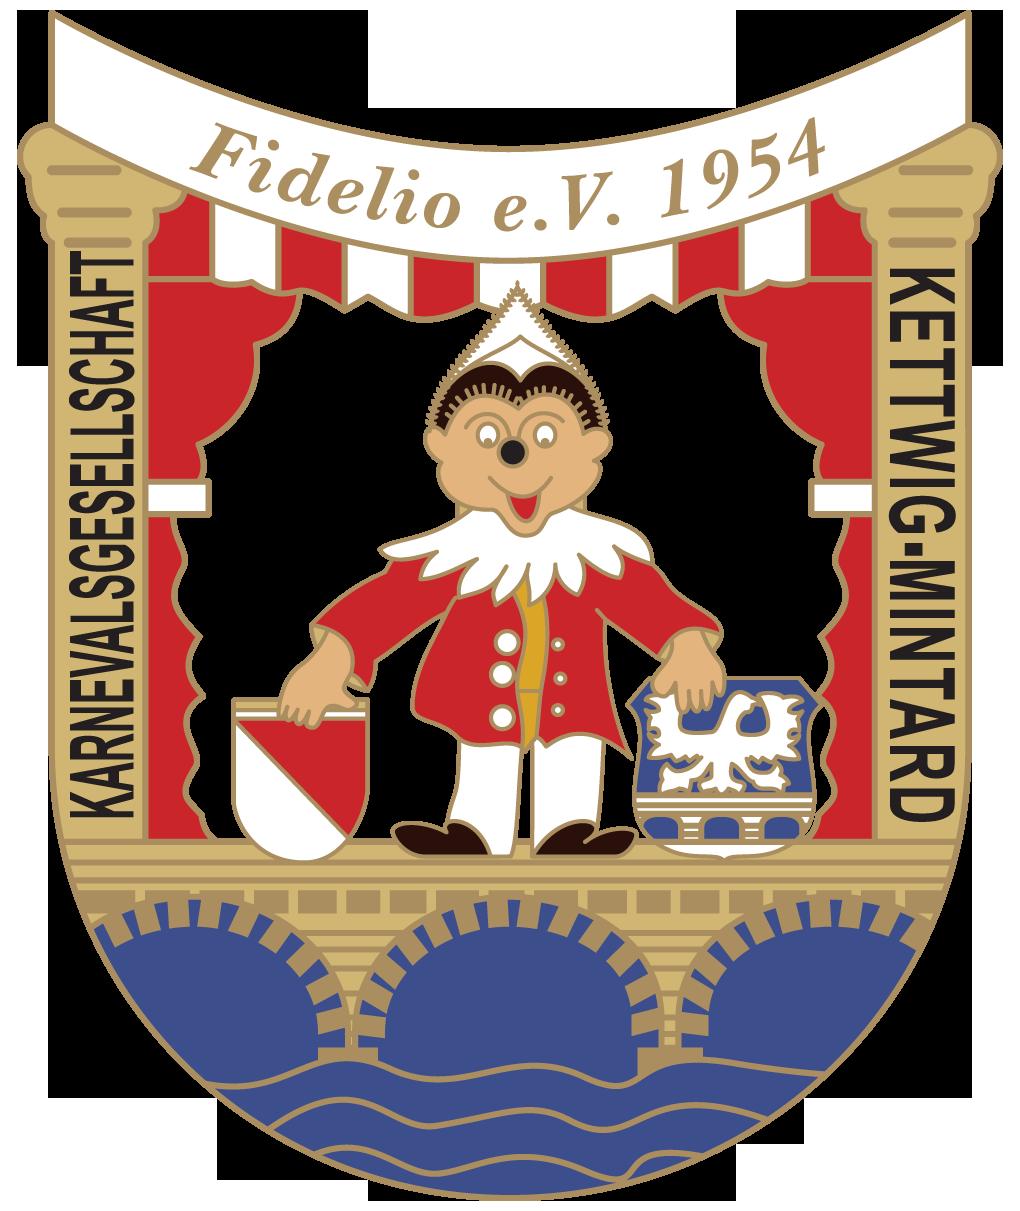 Fidelio Kettwig